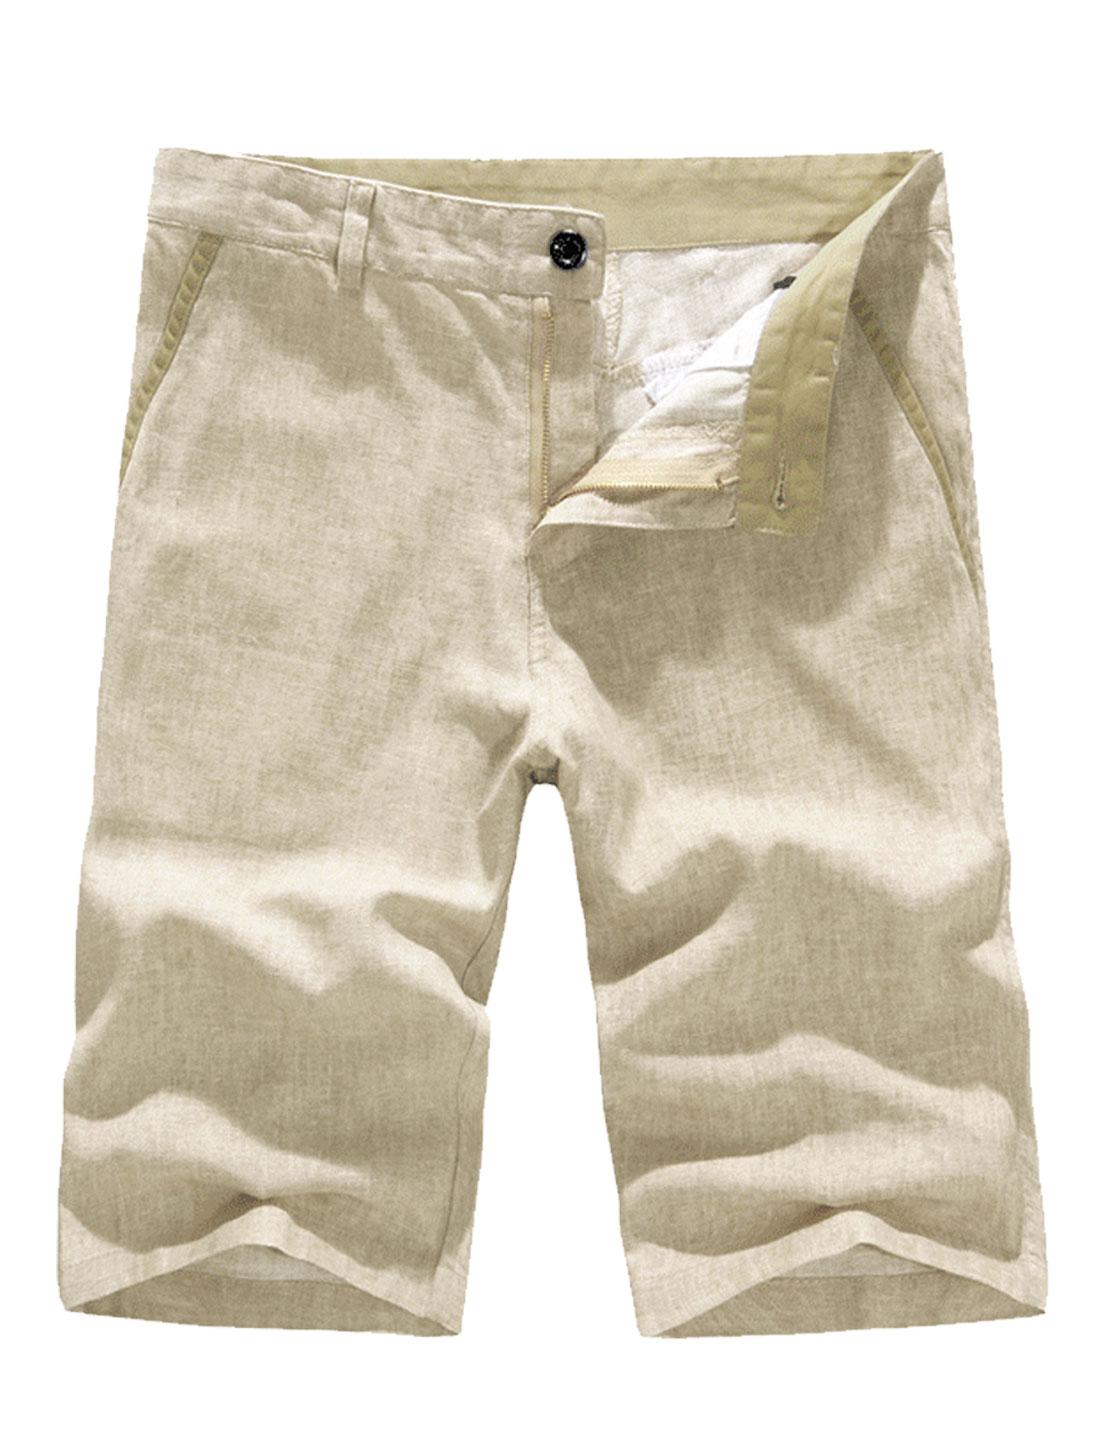 Men Soft Zip Fly Buttons Detail Leisure Shorts Khaki W32